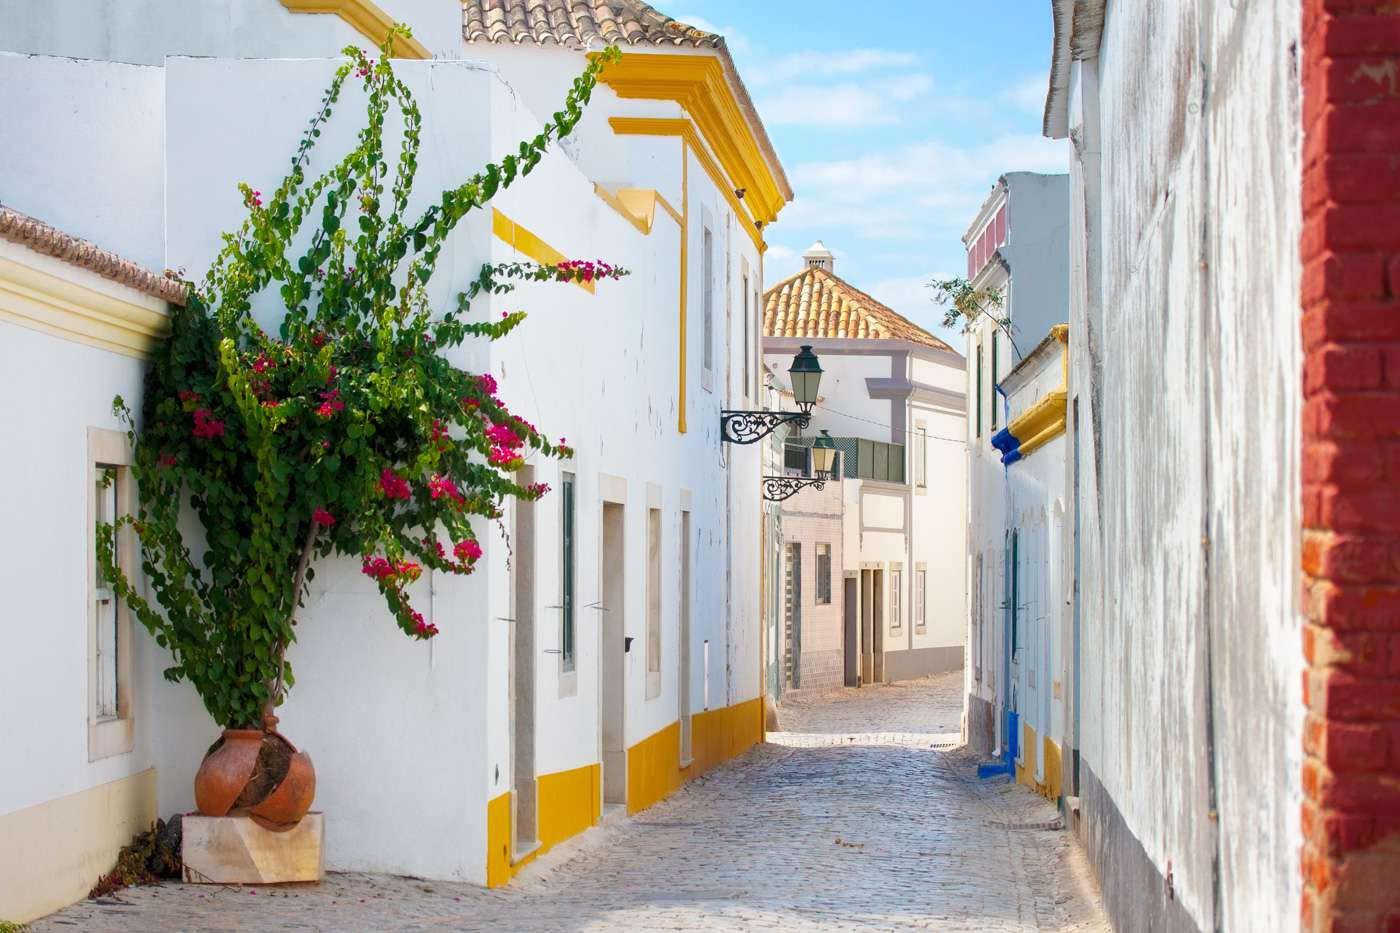 Faro Travel Cost - Average Price of a Vacation to Faro ...